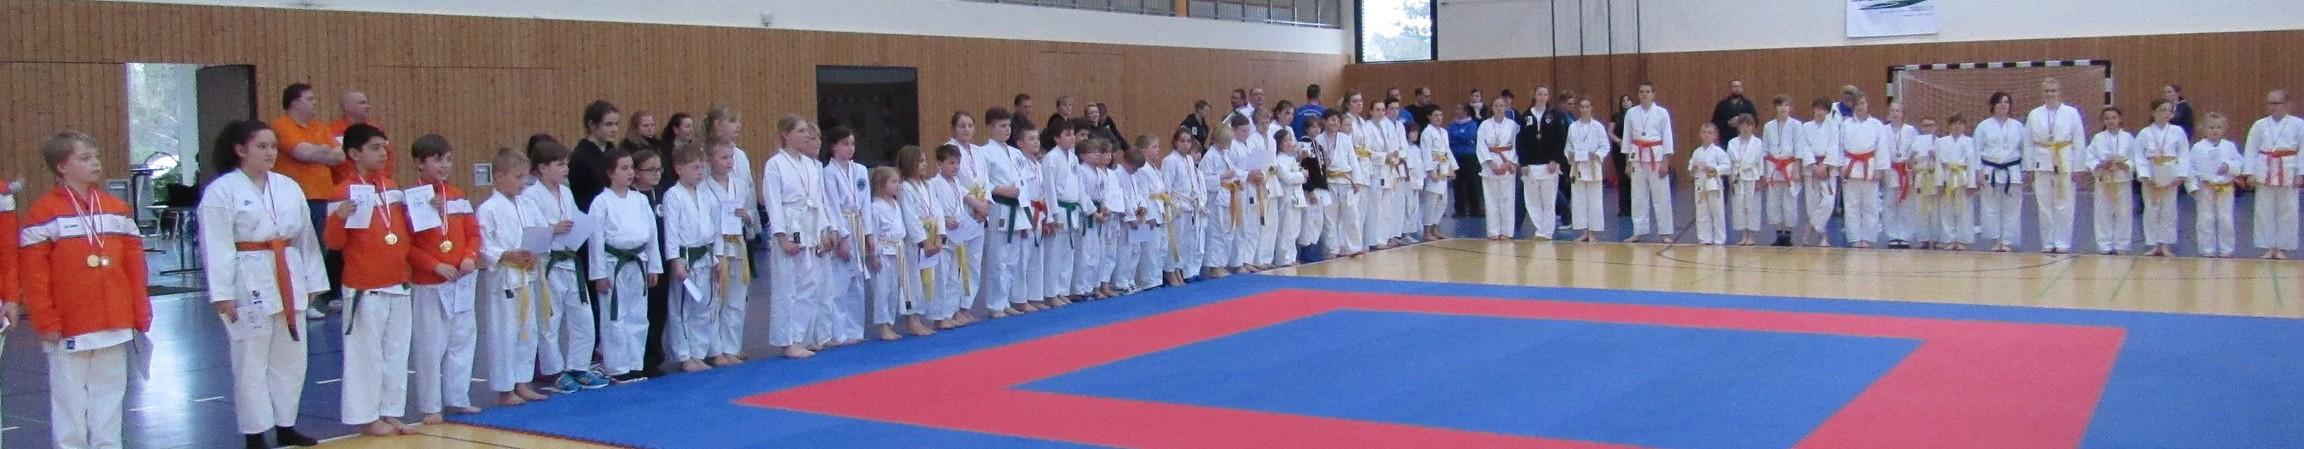 SC Karate Bestensee